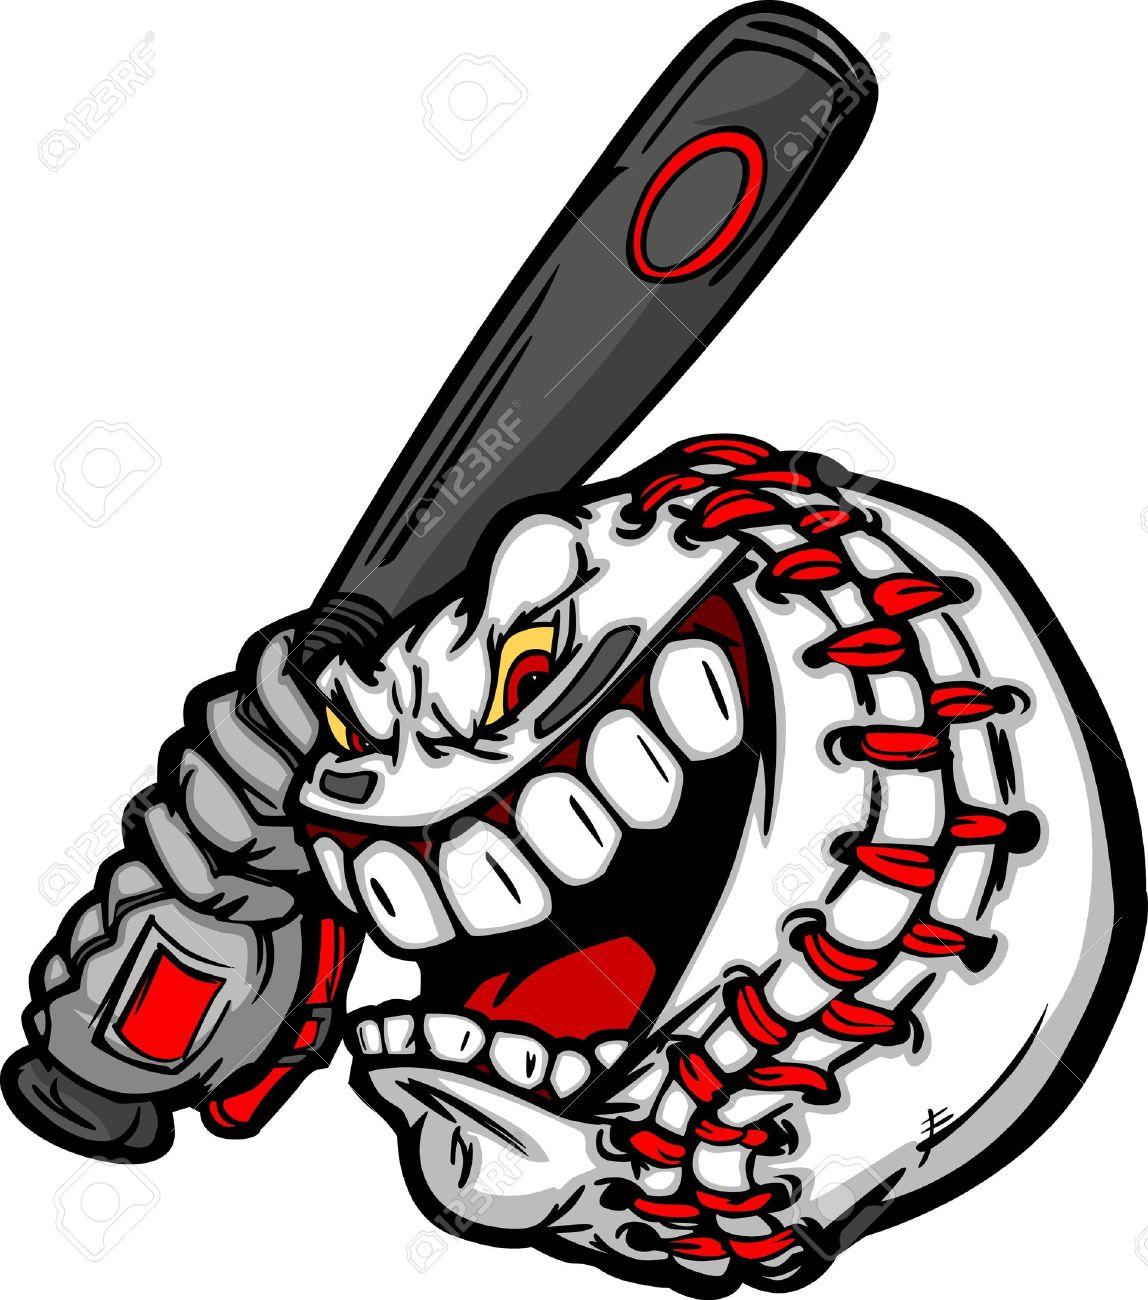 1148x1300 Cartoon Baseball Ball Face Holding Baseball Bat Illustration